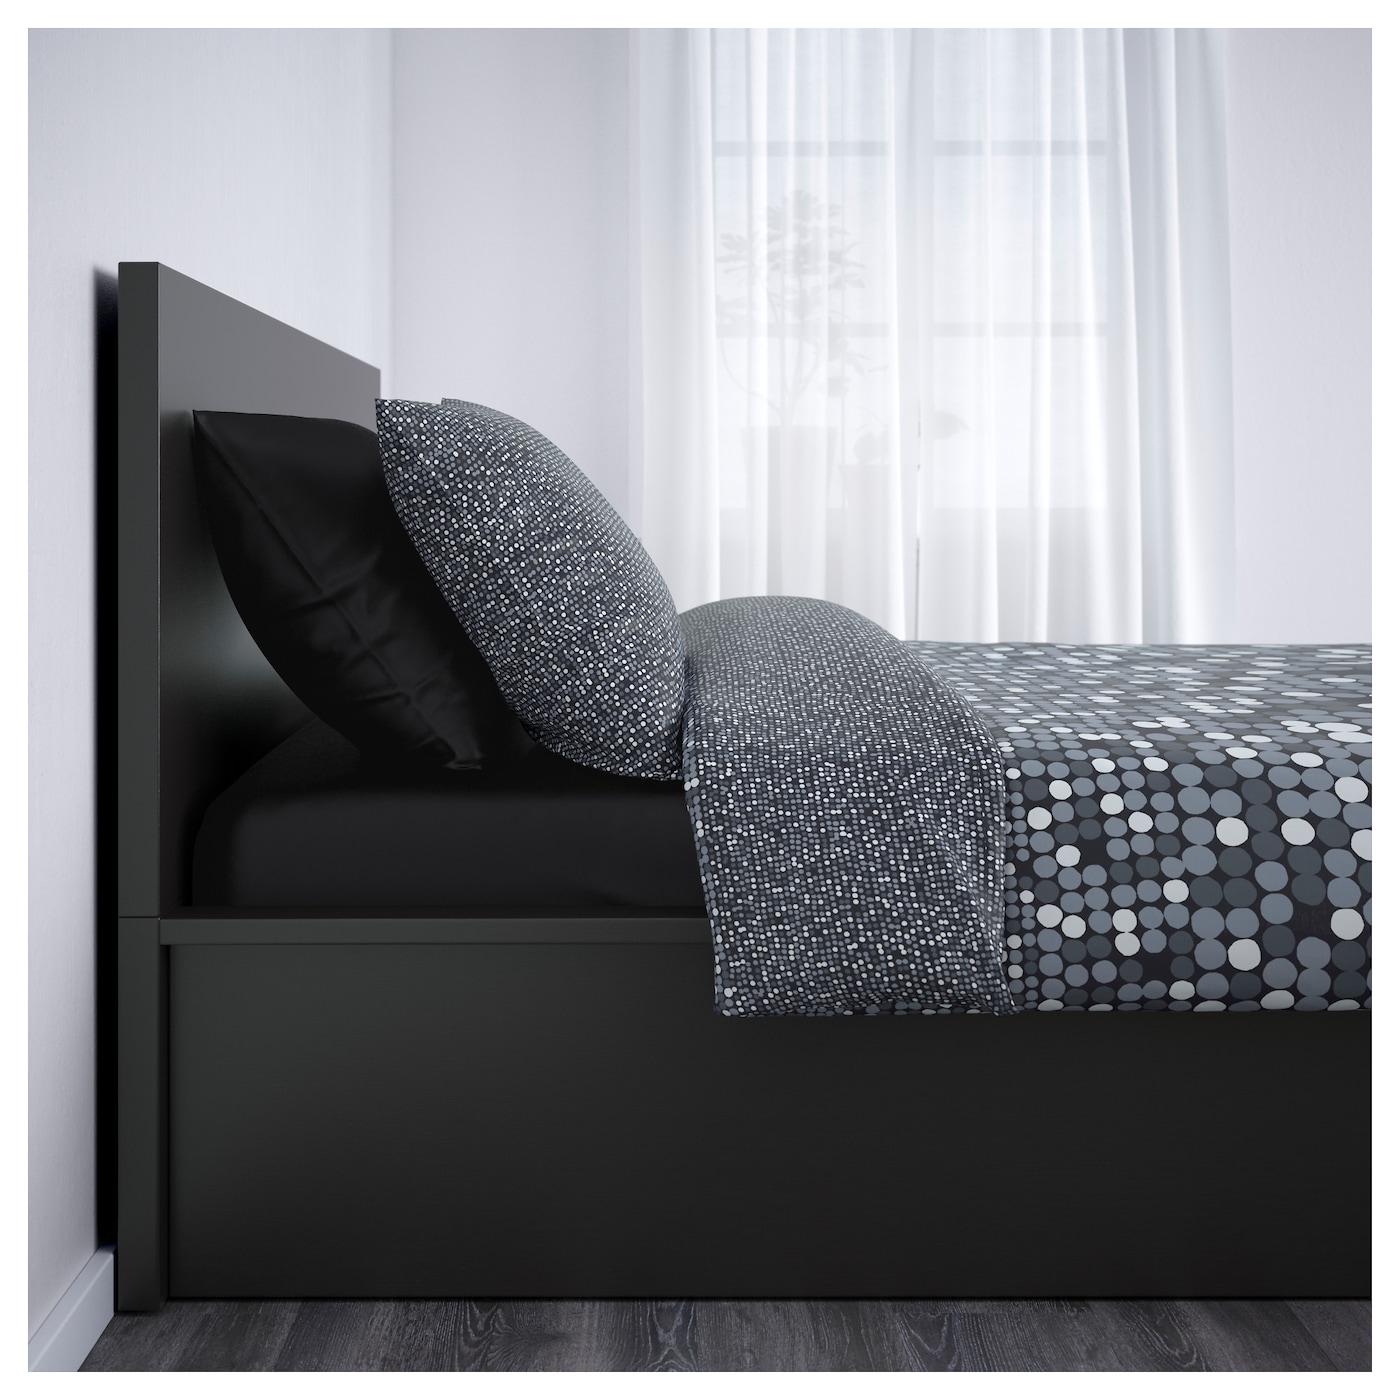 malm bedframe met opbergruimte zwartbruin 180x200 cm ikea. Black Bedroom Furniture Sets. Home Design Ideas